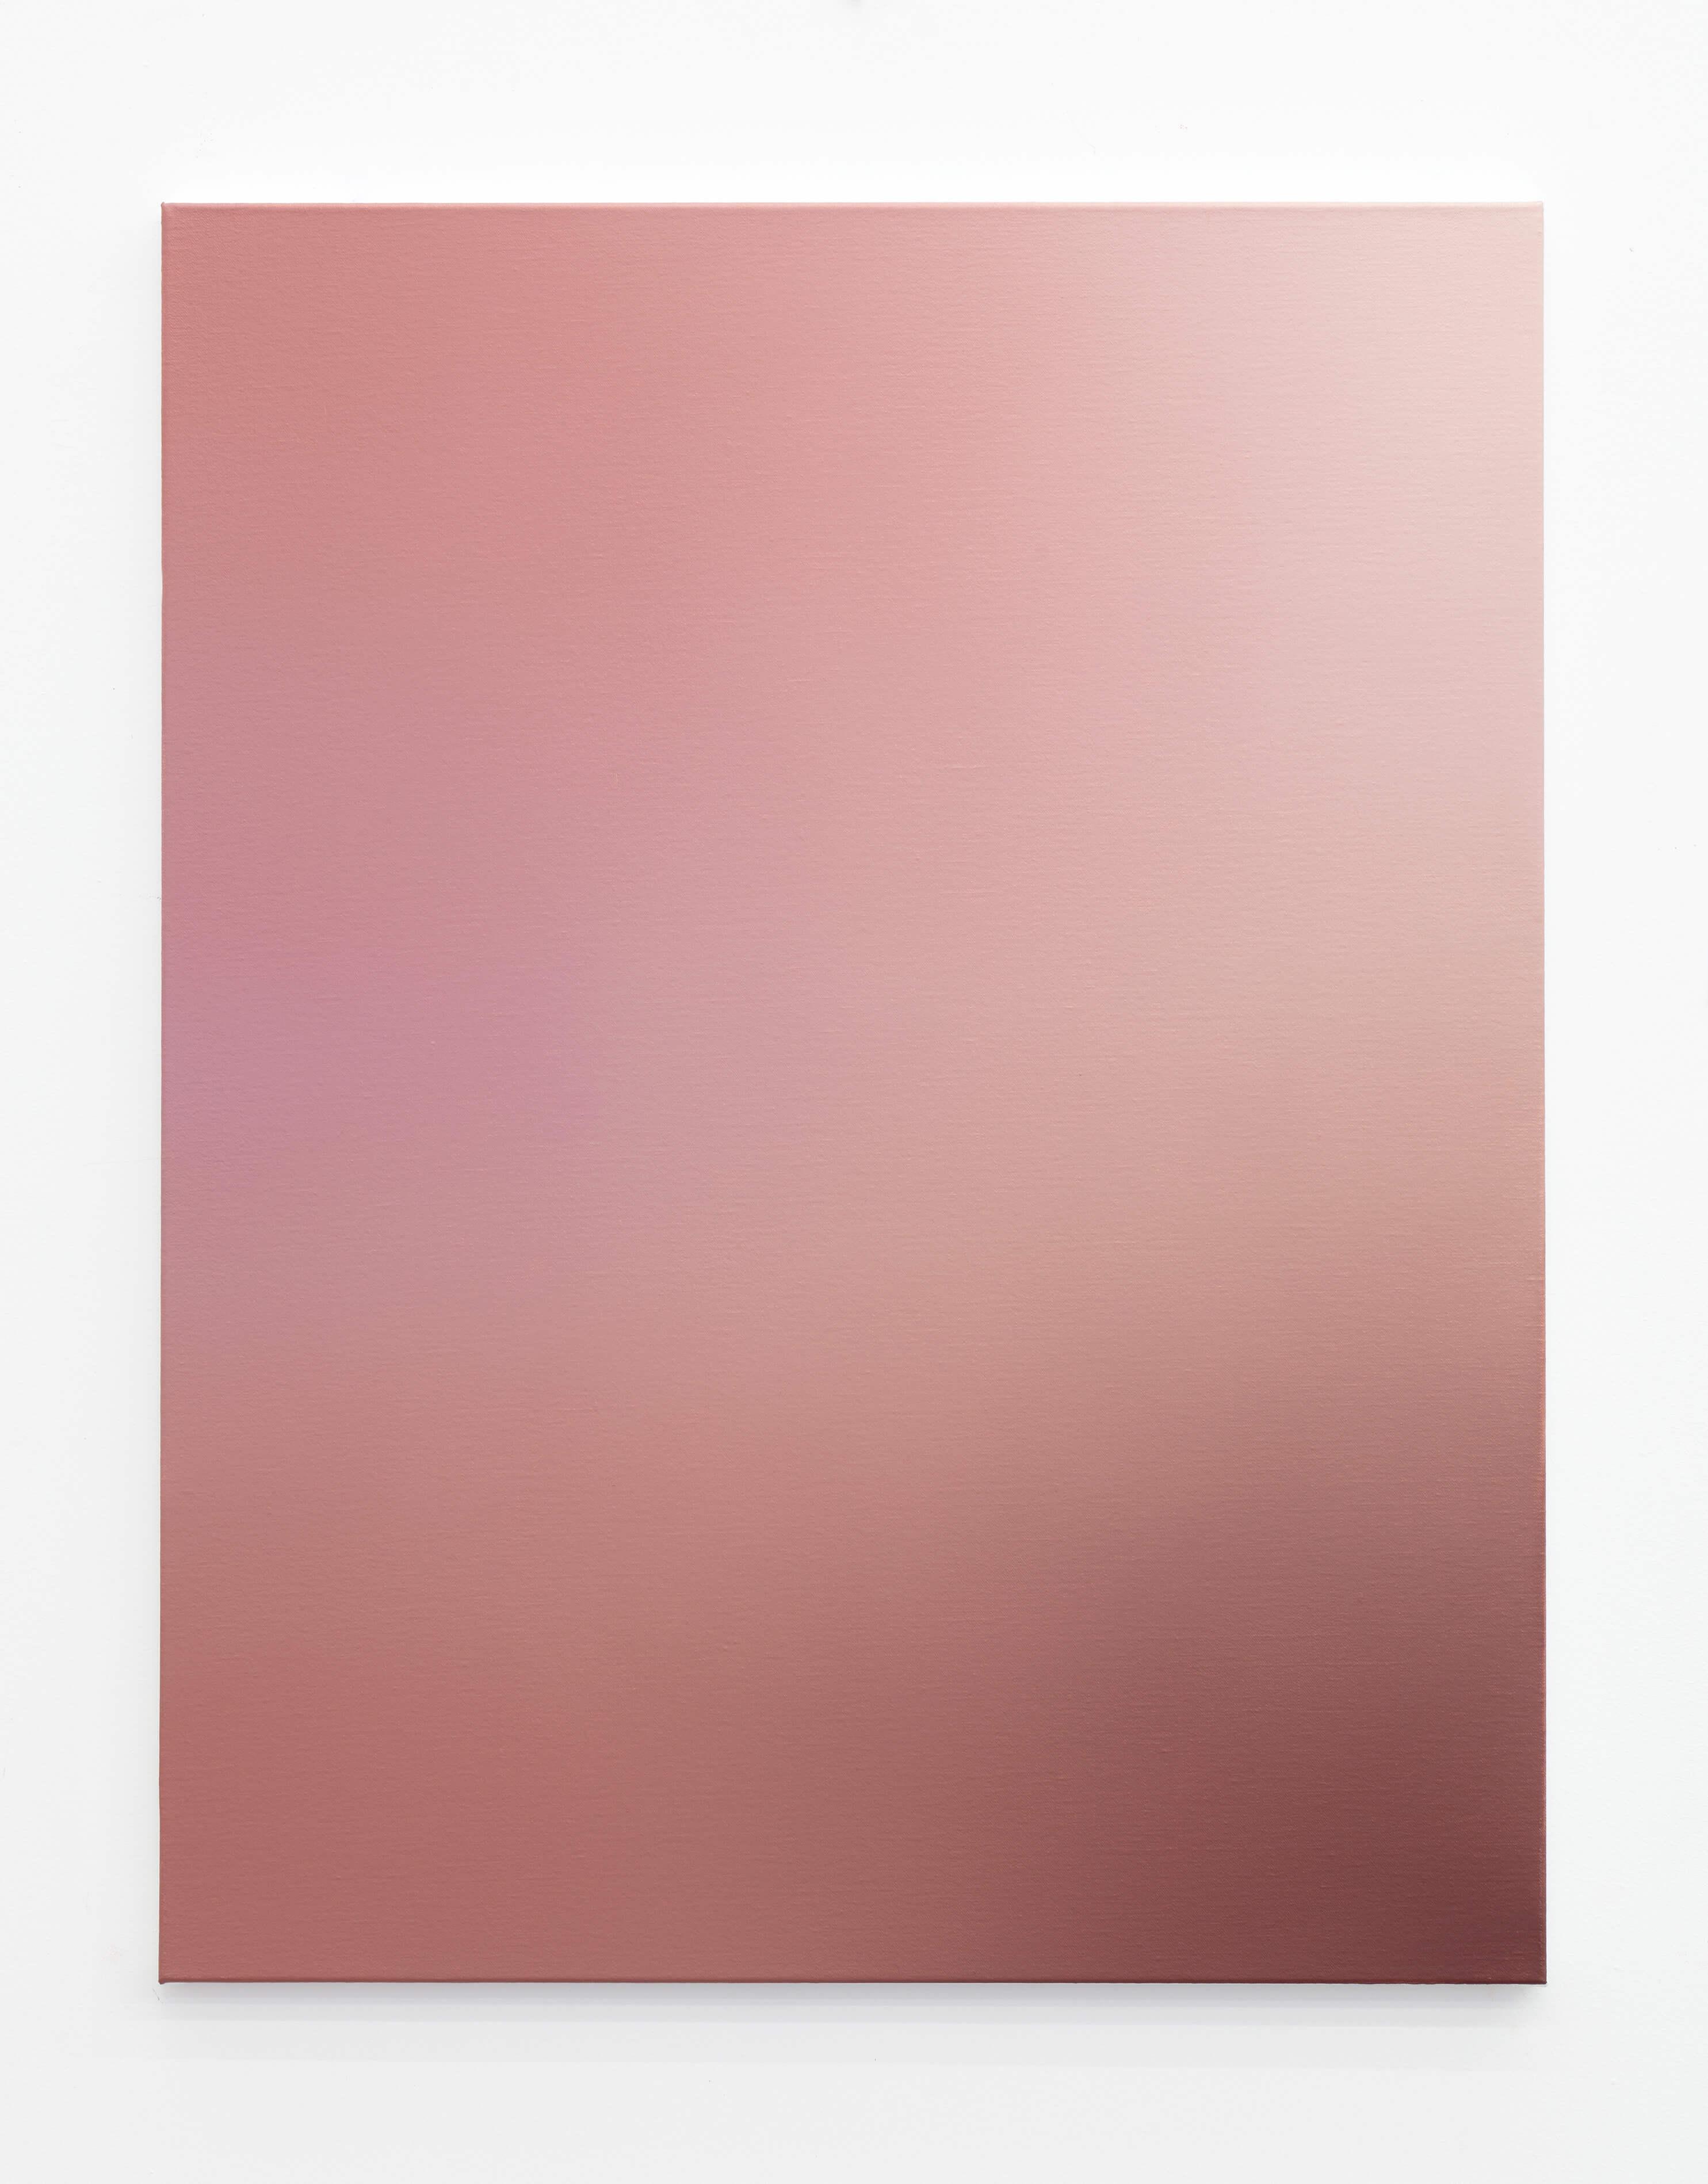 Untitled, 2019 |  | ProjecteSD